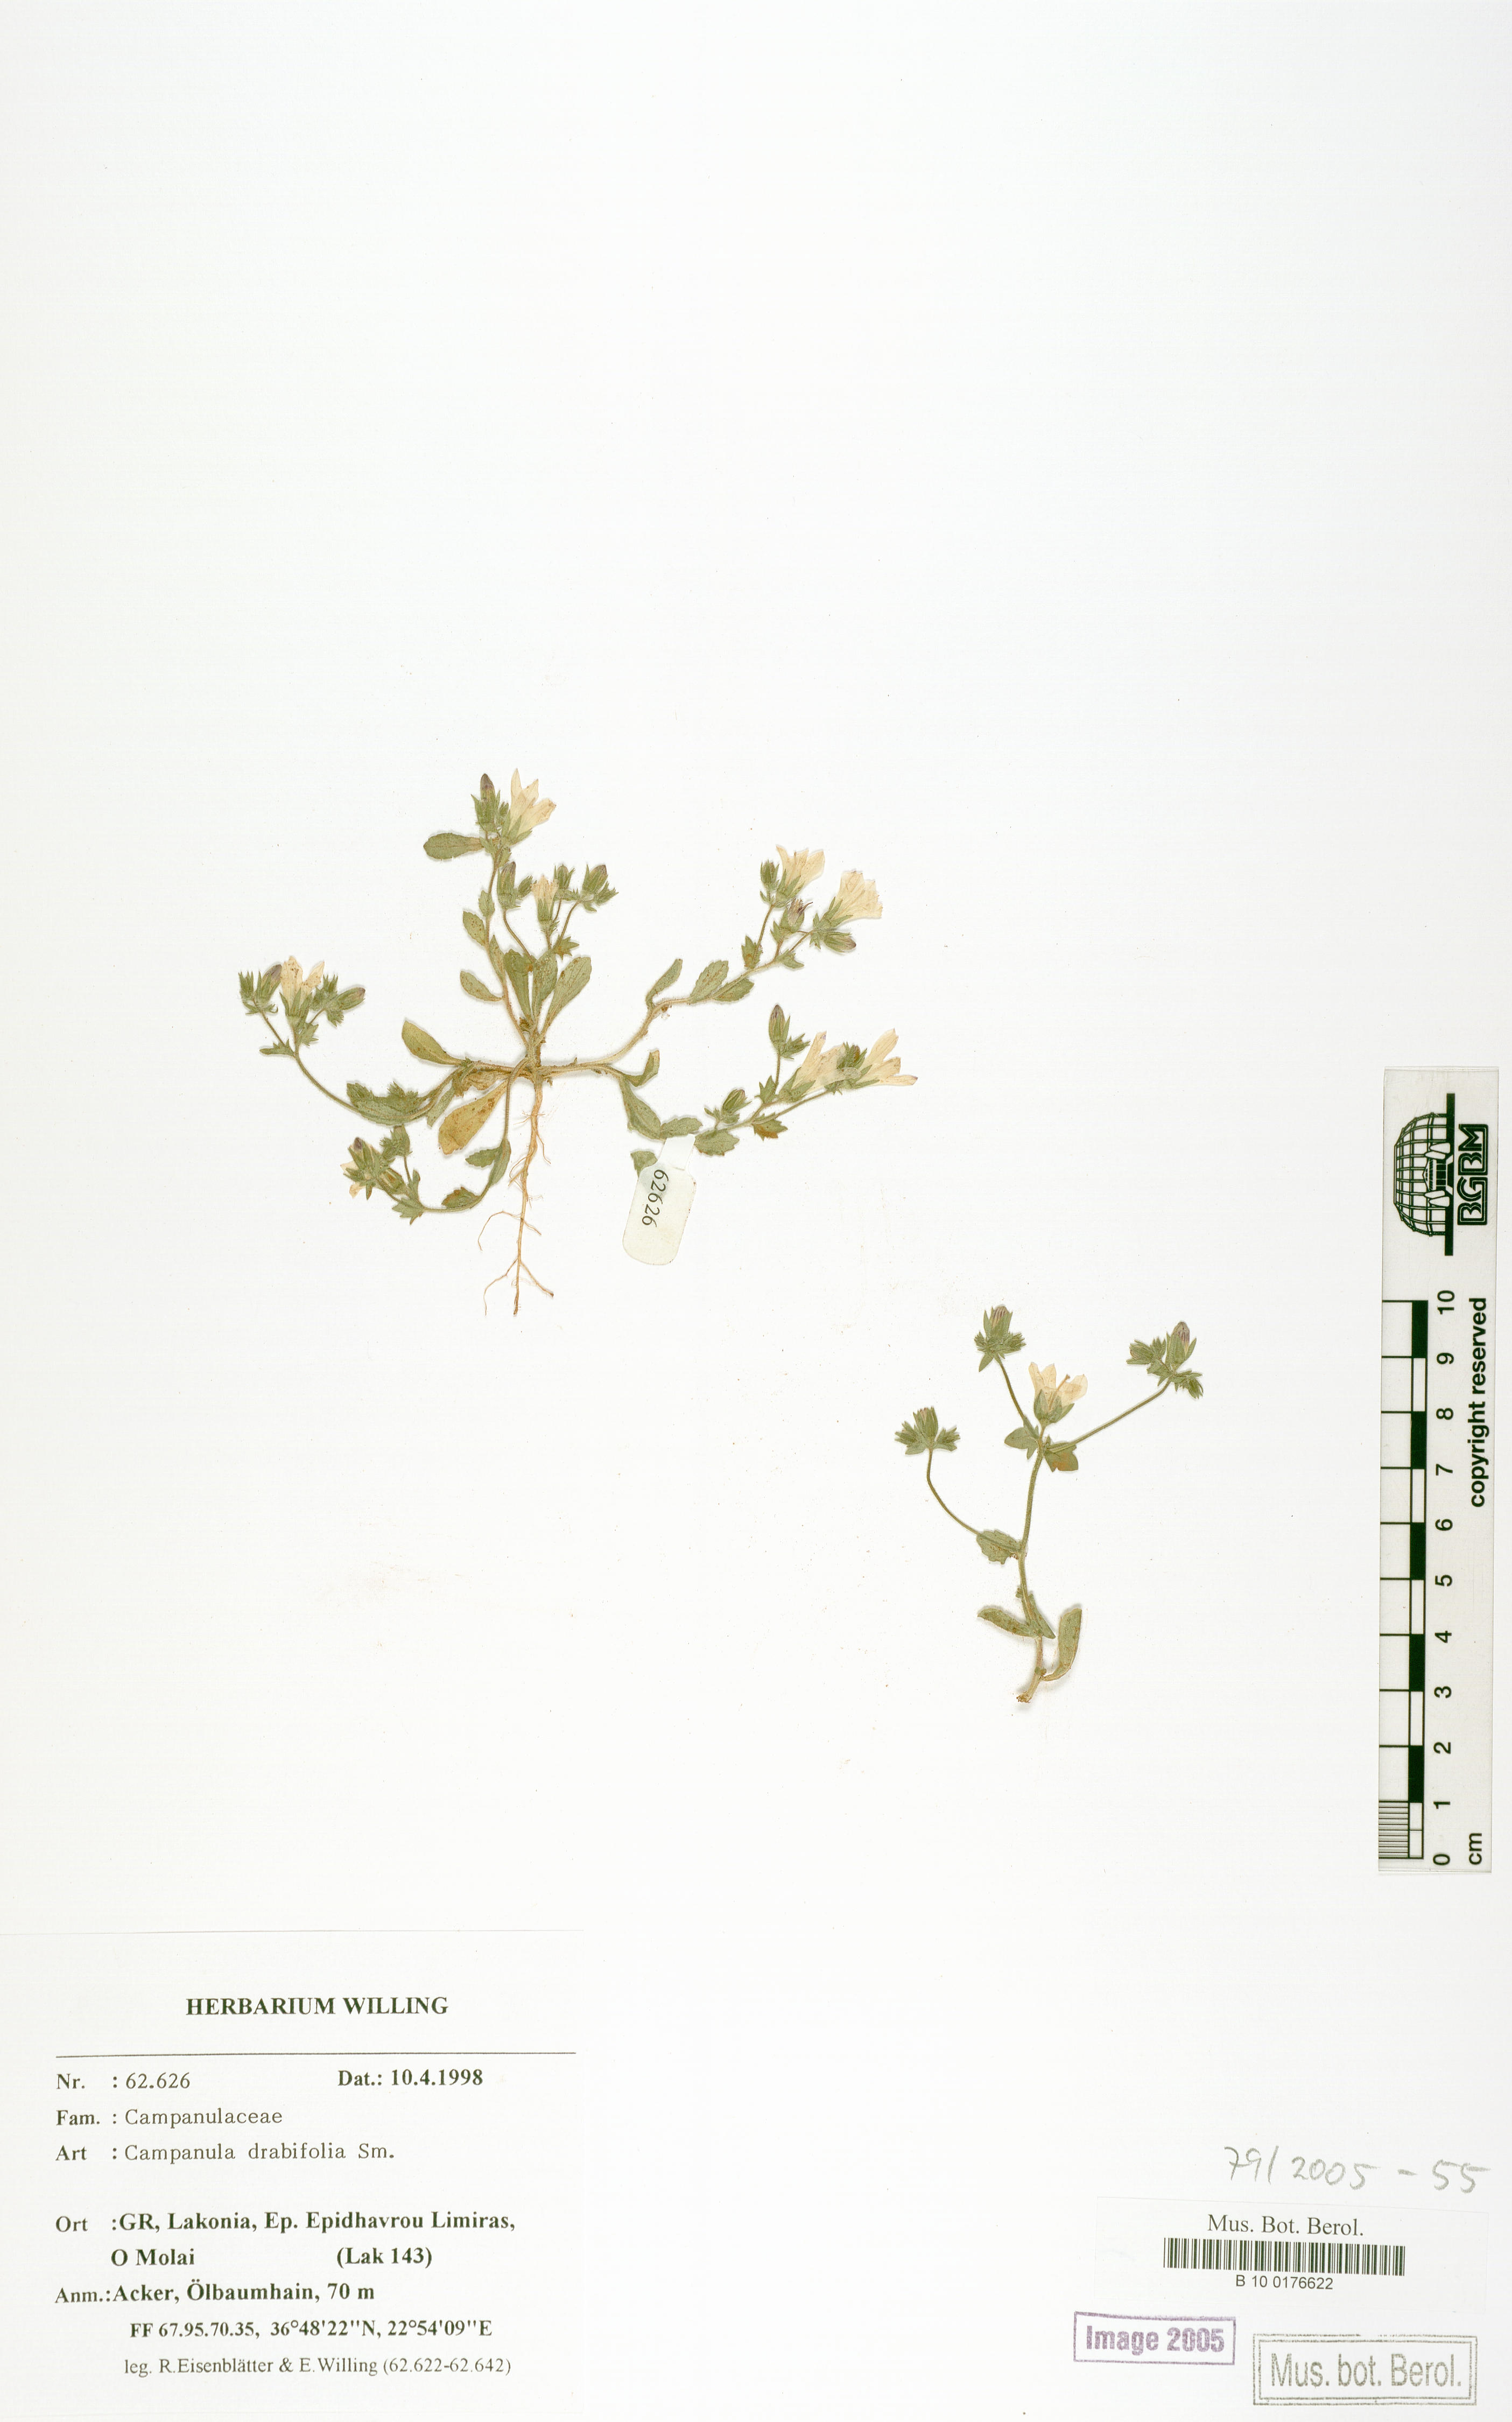 http://ww2.bgbm.org/herbarium/images/B/10/01/76/62/B_10_0176622.jpg